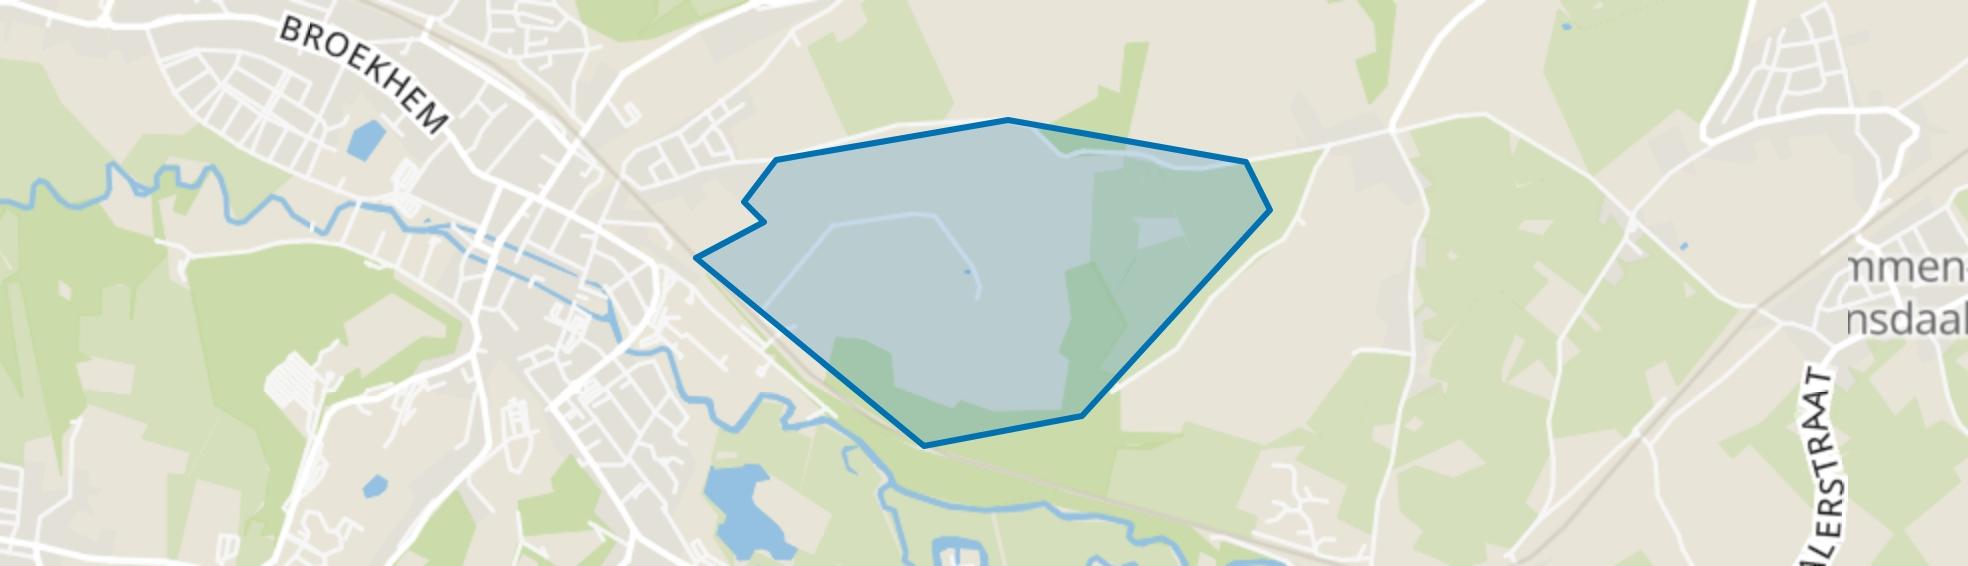 Euverem, Valkenburg (LI) map